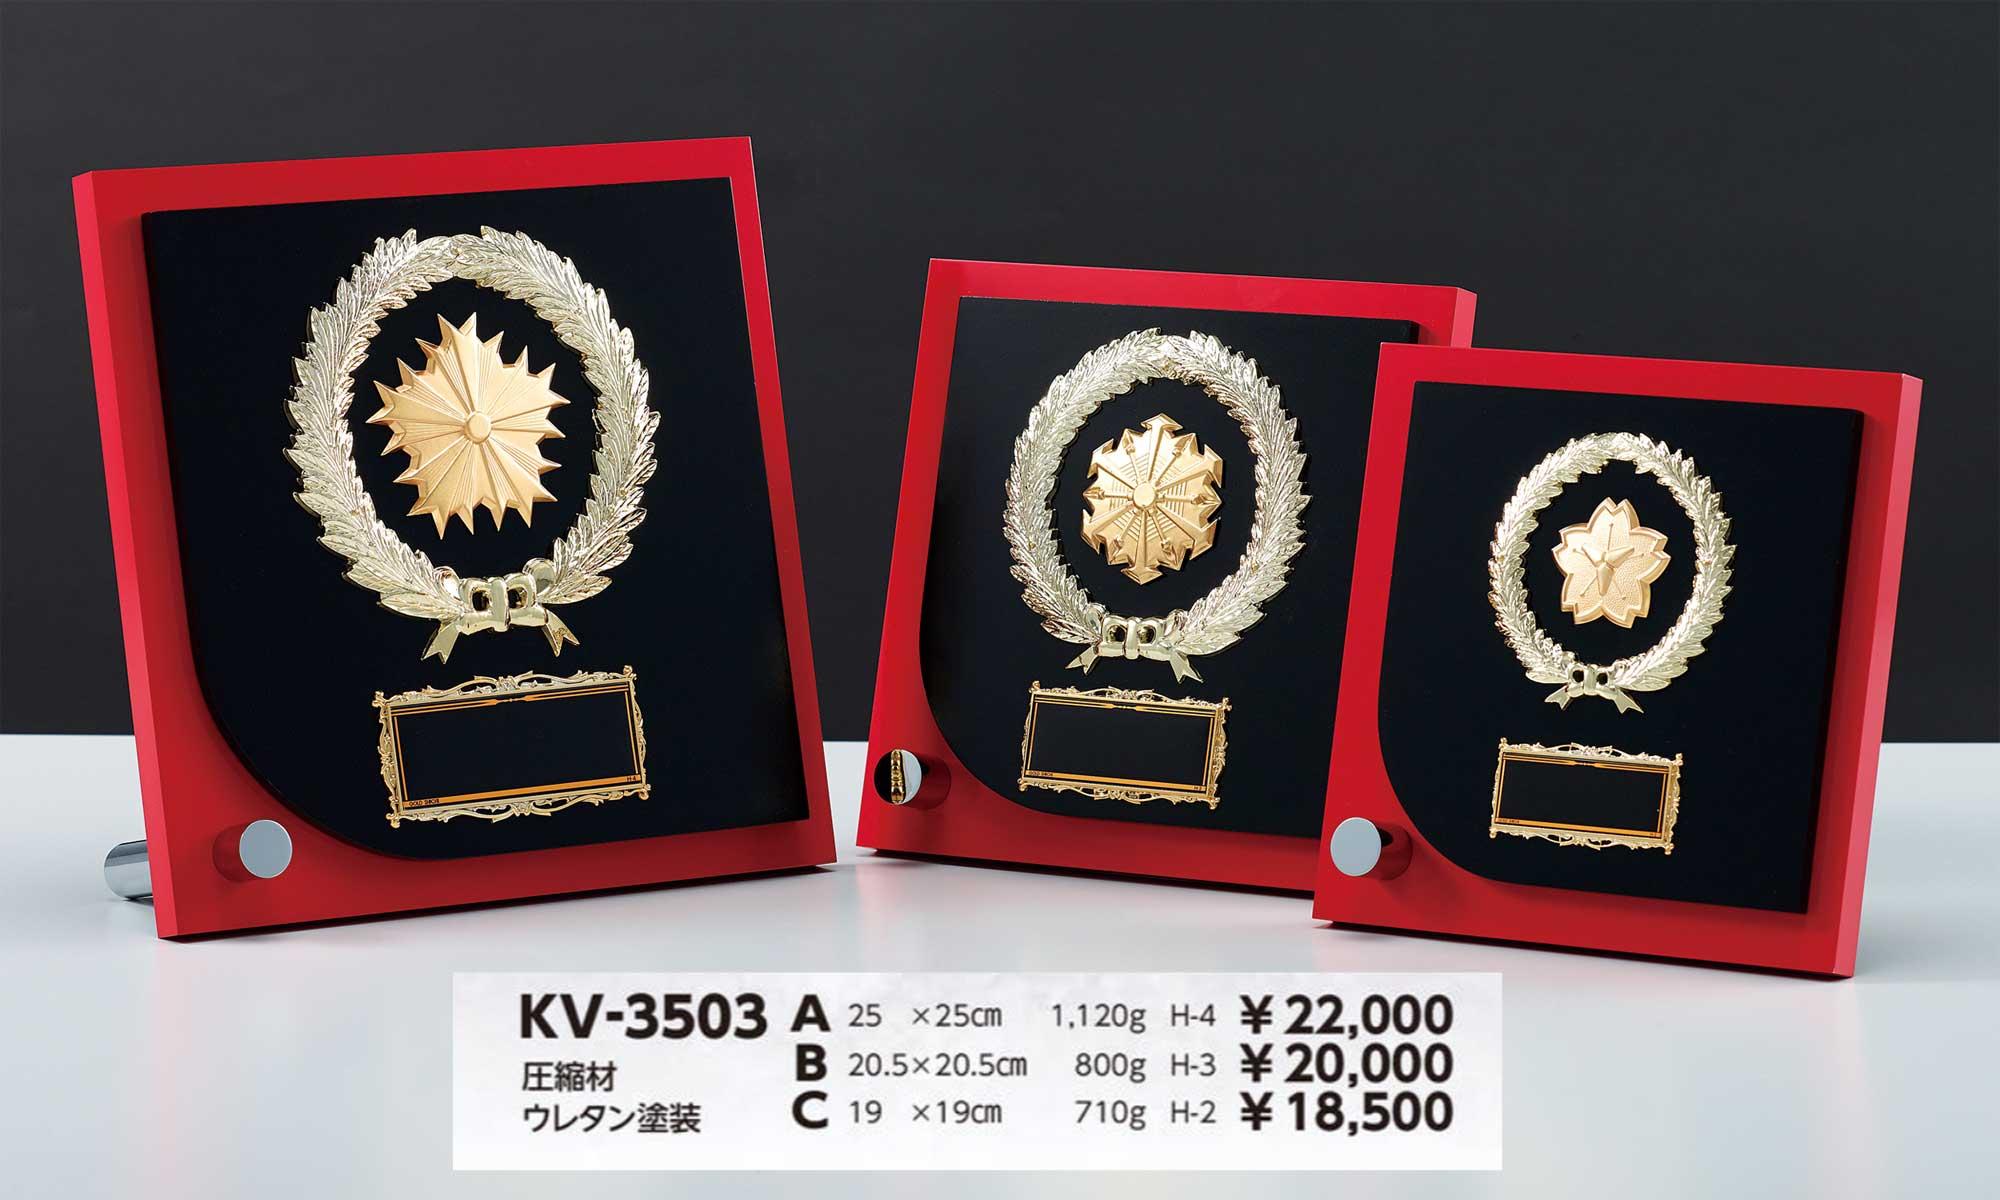 KV3503